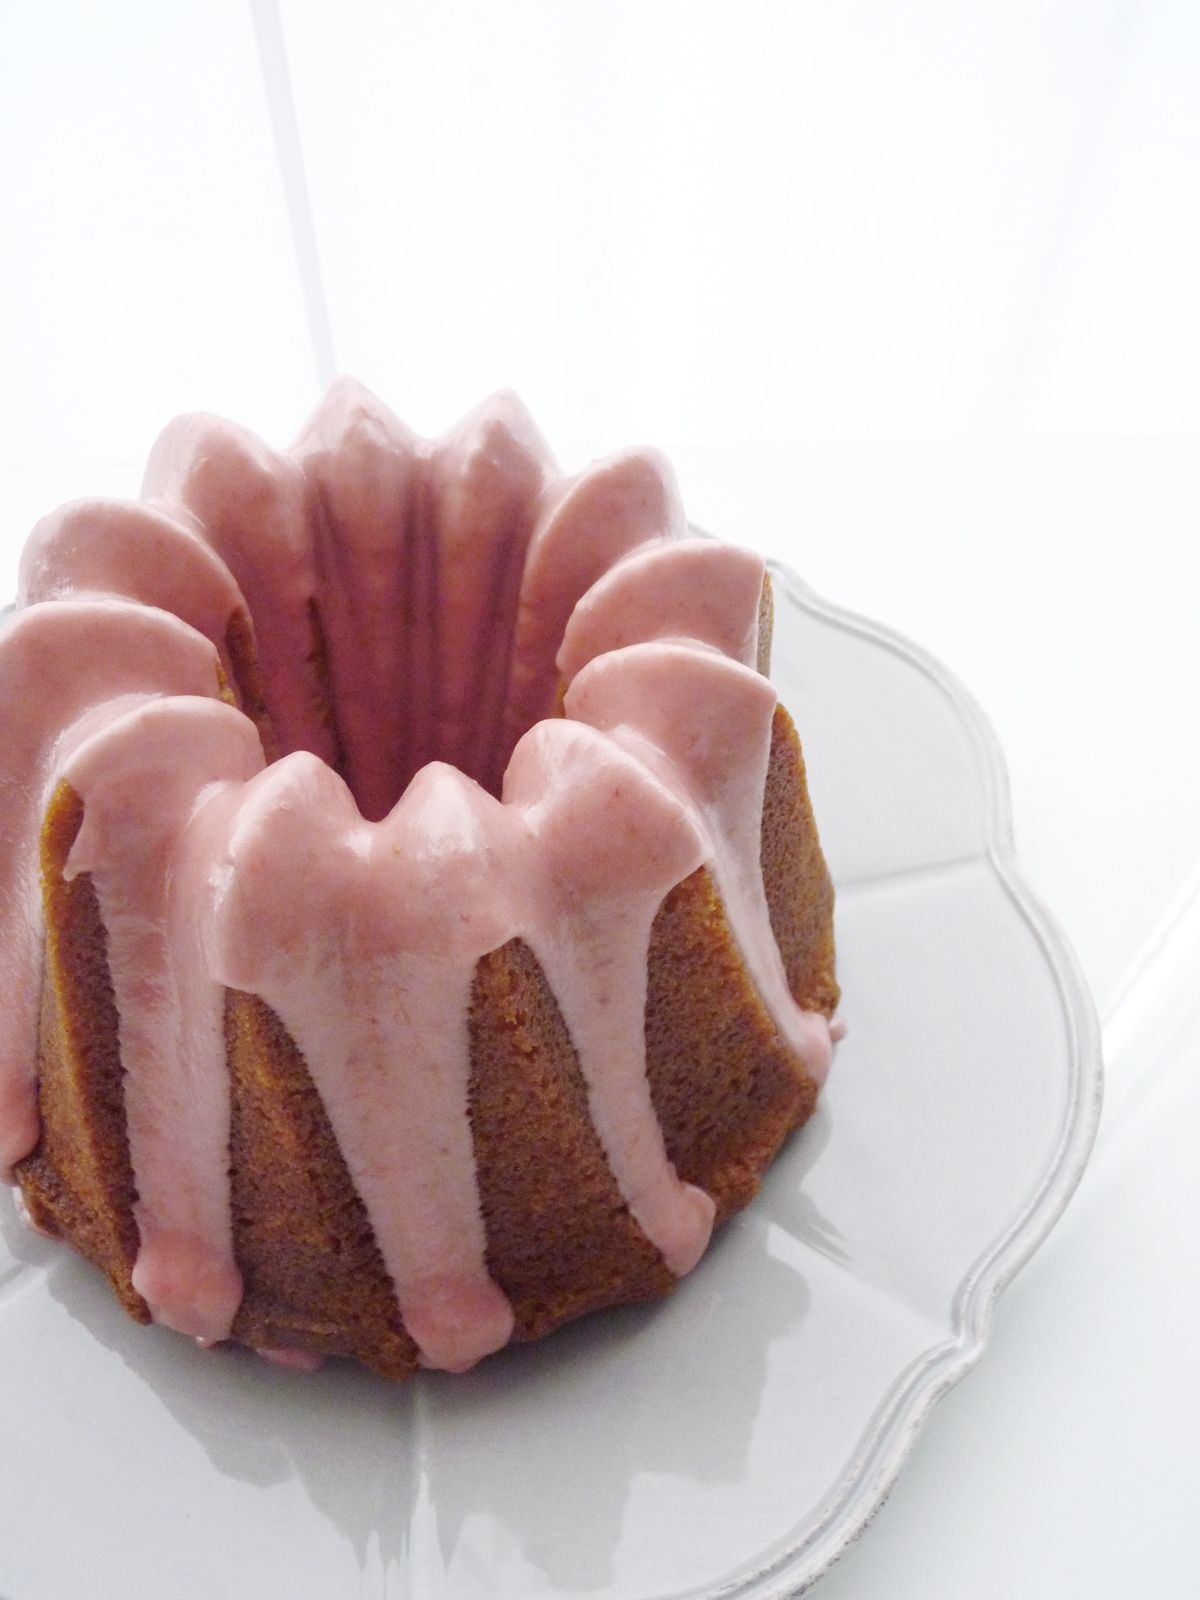 Strawberry glaze recipe for bundt cake